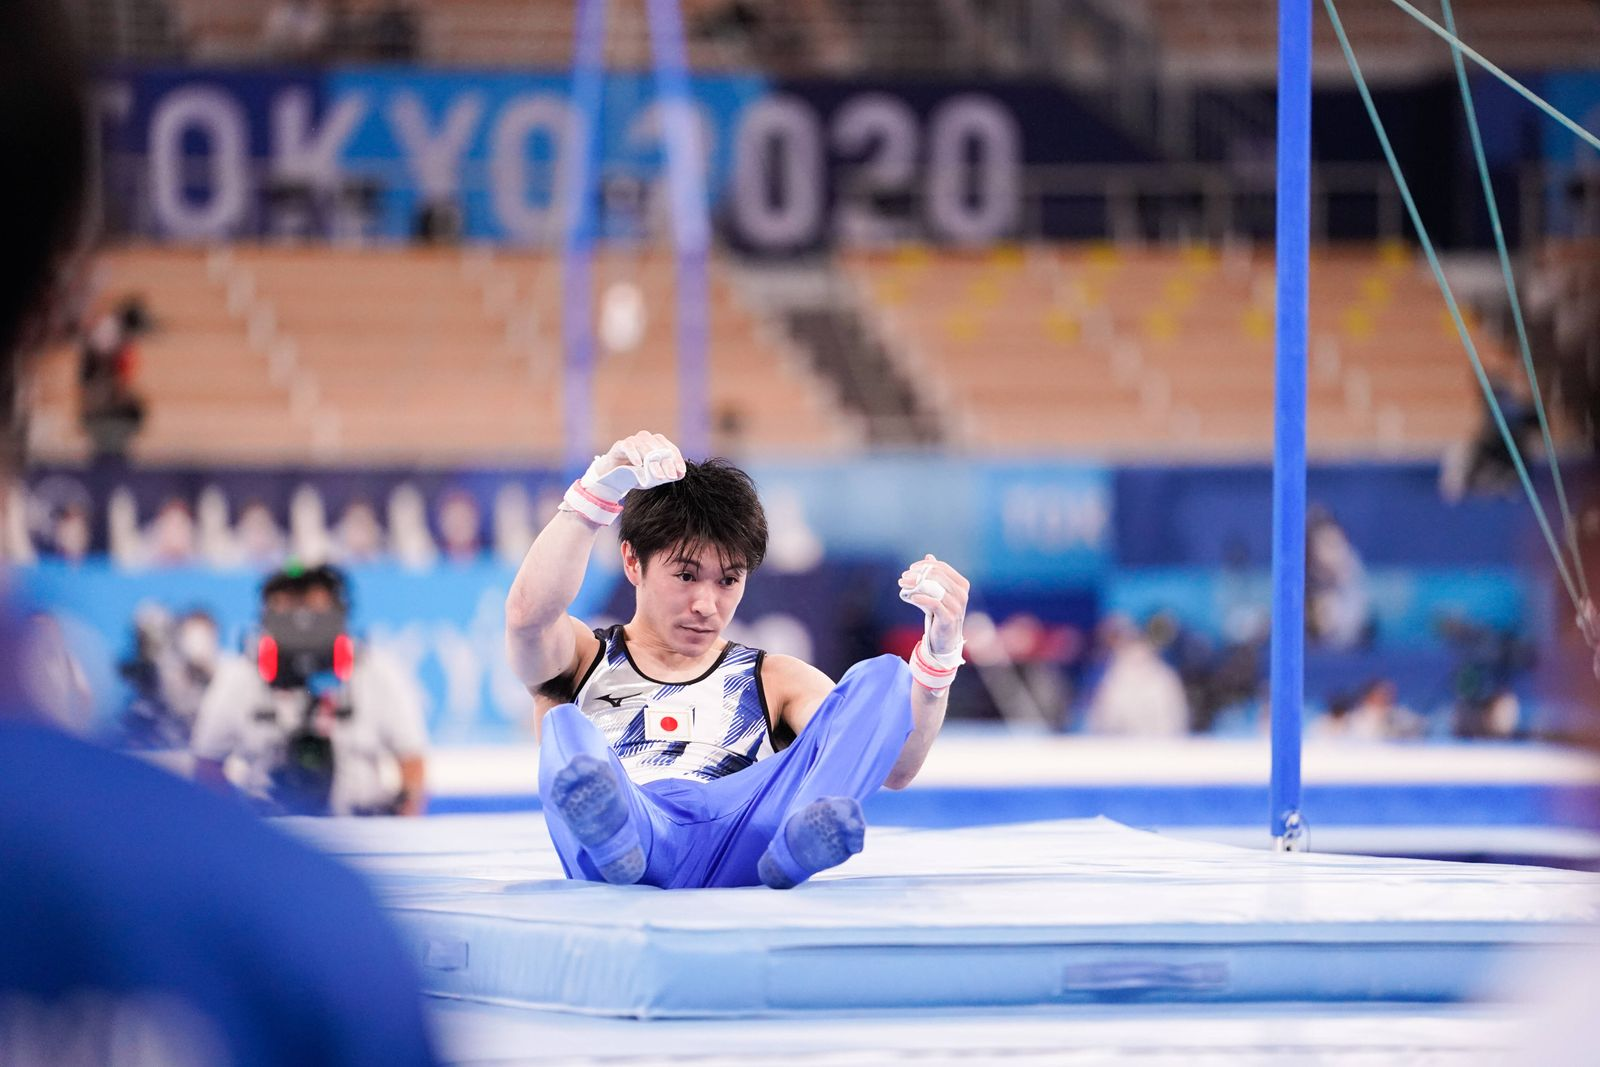 Kohei Uchimura (JPN), JULY 24, 2021 - Gymnastics - Artistic : Men s Qualification during the Tokyo 2020 Olympic Games, O